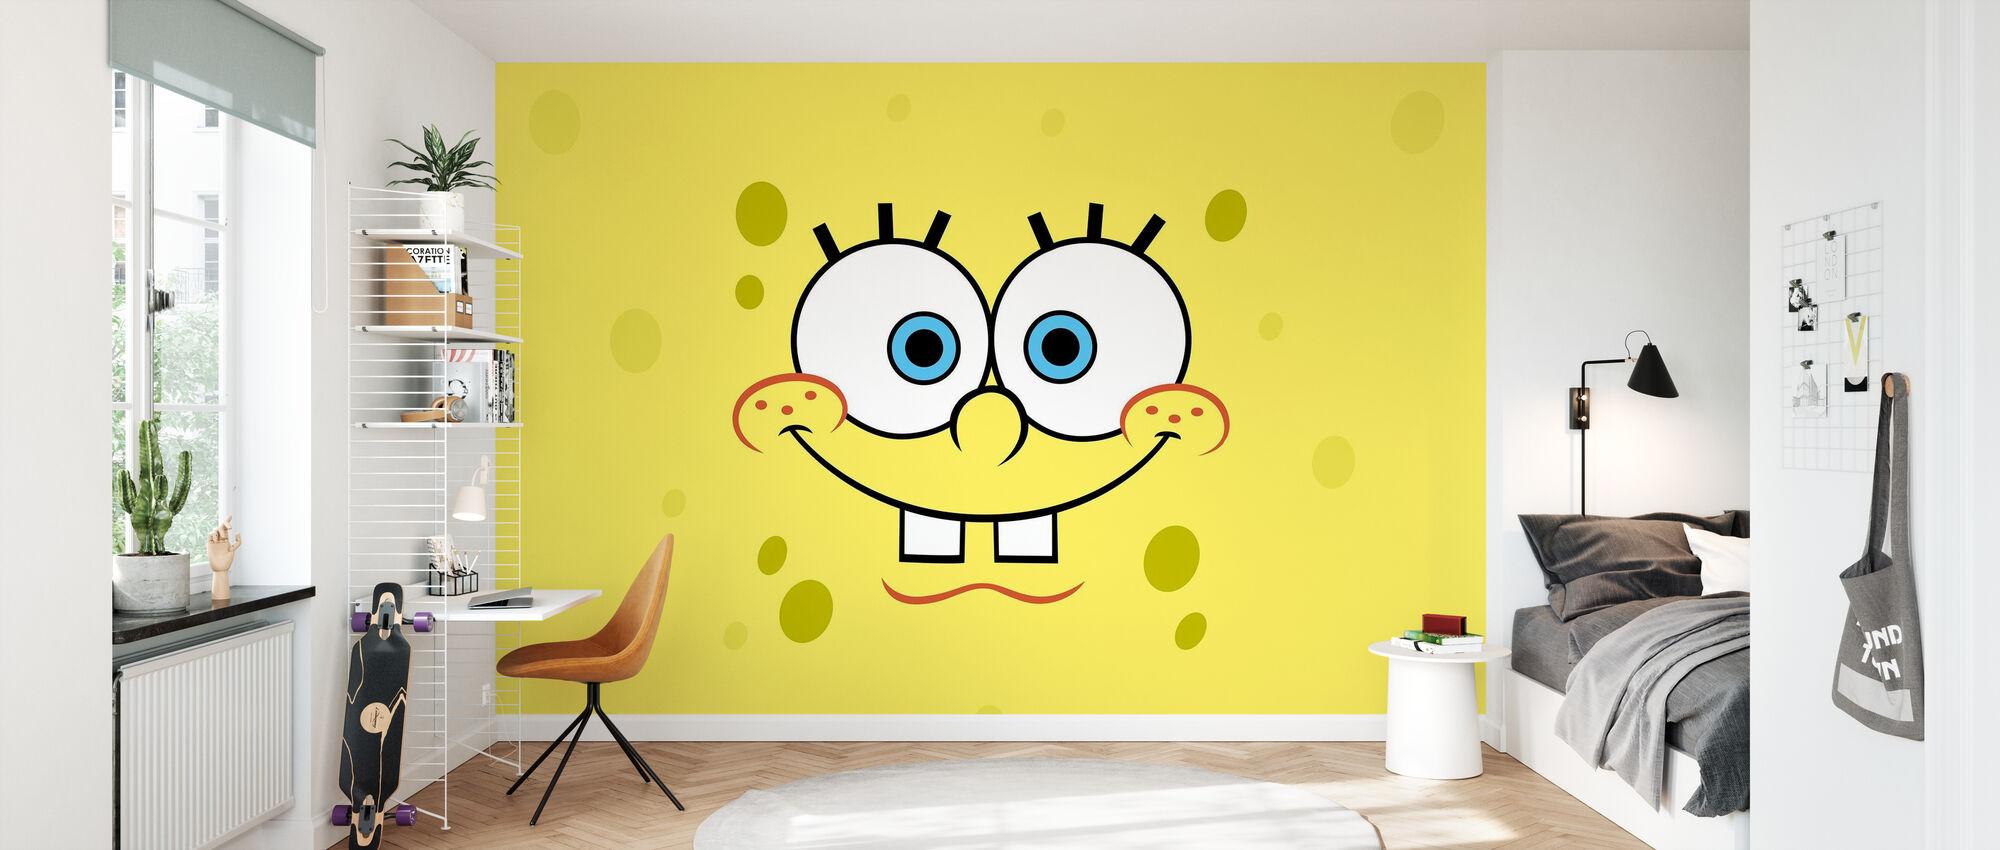 Sponge Bob - The Joyful Sea Sponge - Tapete - Kinderzimmer